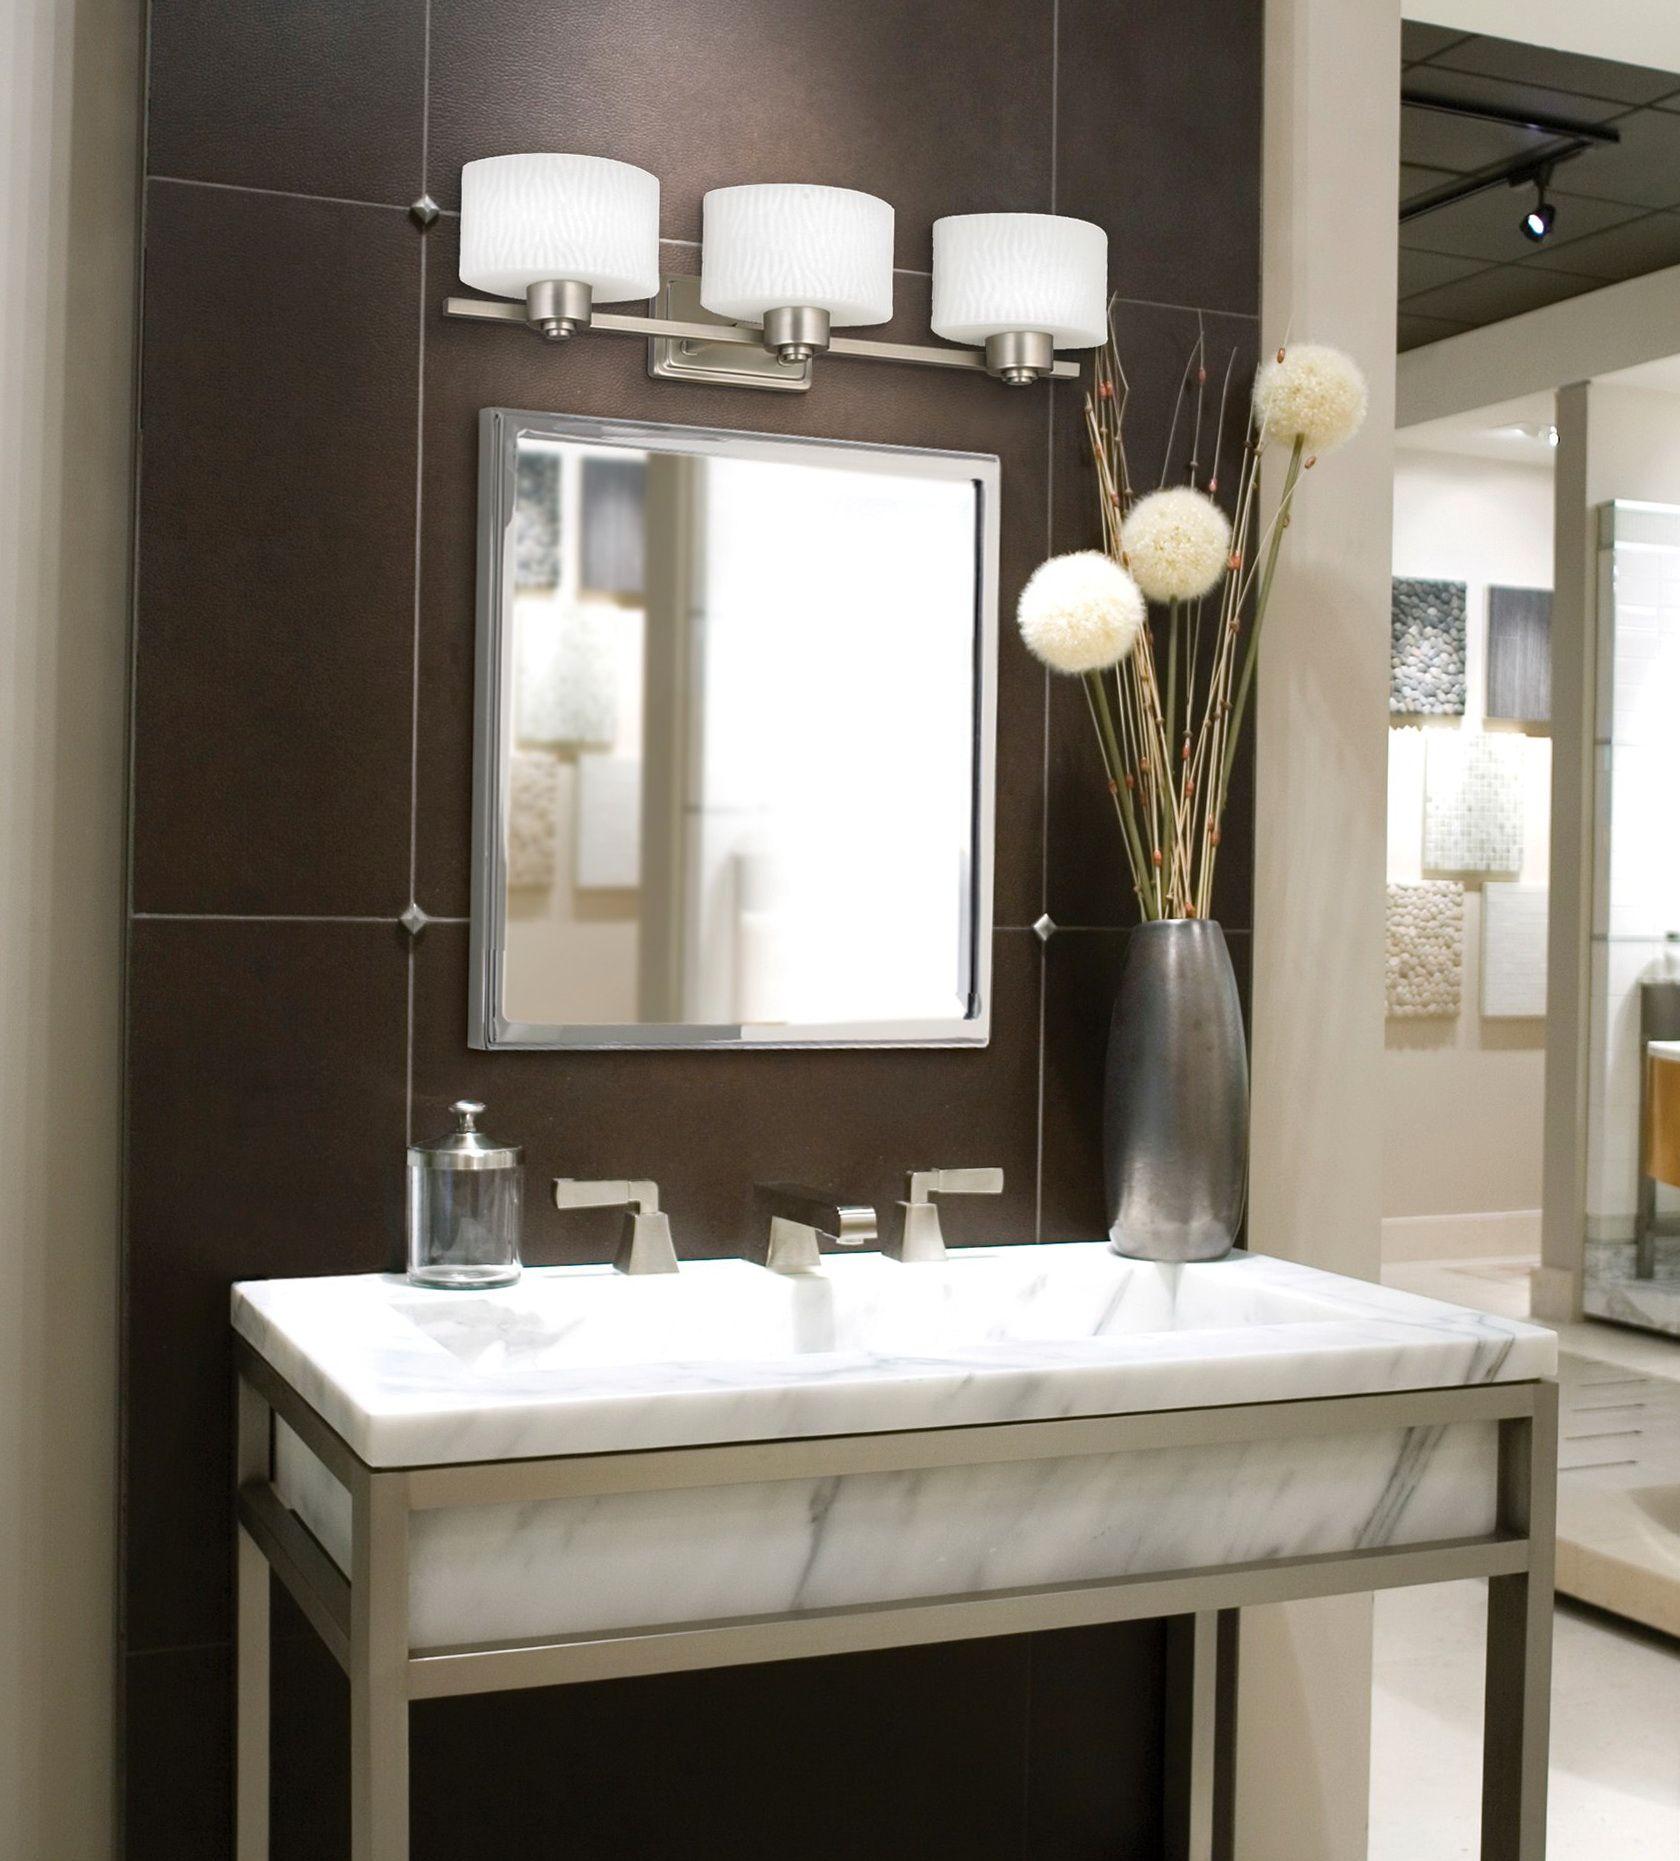 image result for bathroom vanity mirrors lights | bathroom